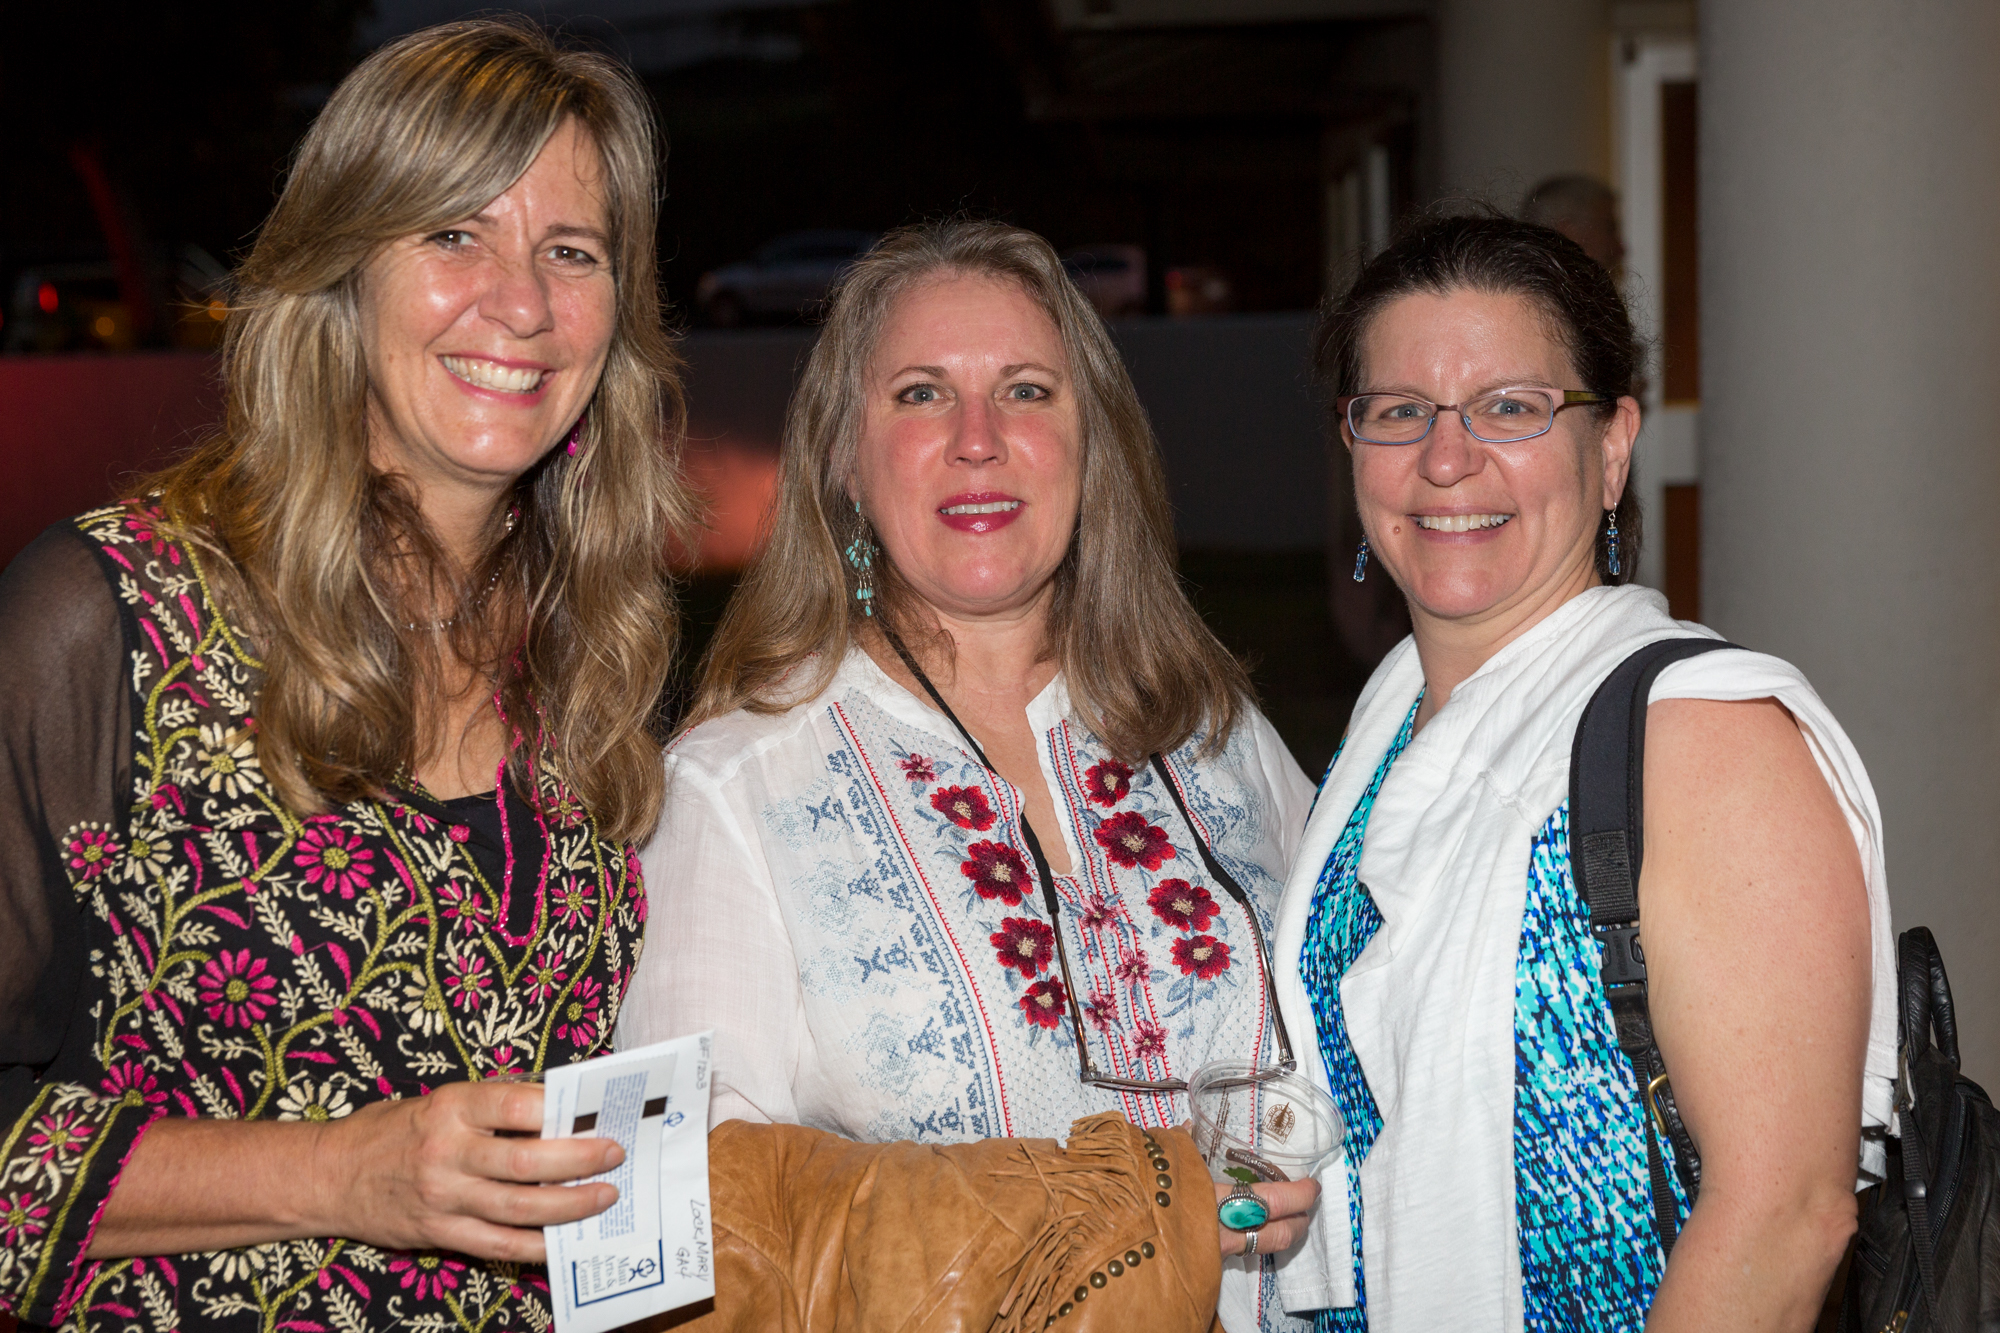 Mary Lock, Kathy Baldwin, and Sarah Cavanaugh at William Finnegan in The Green Room